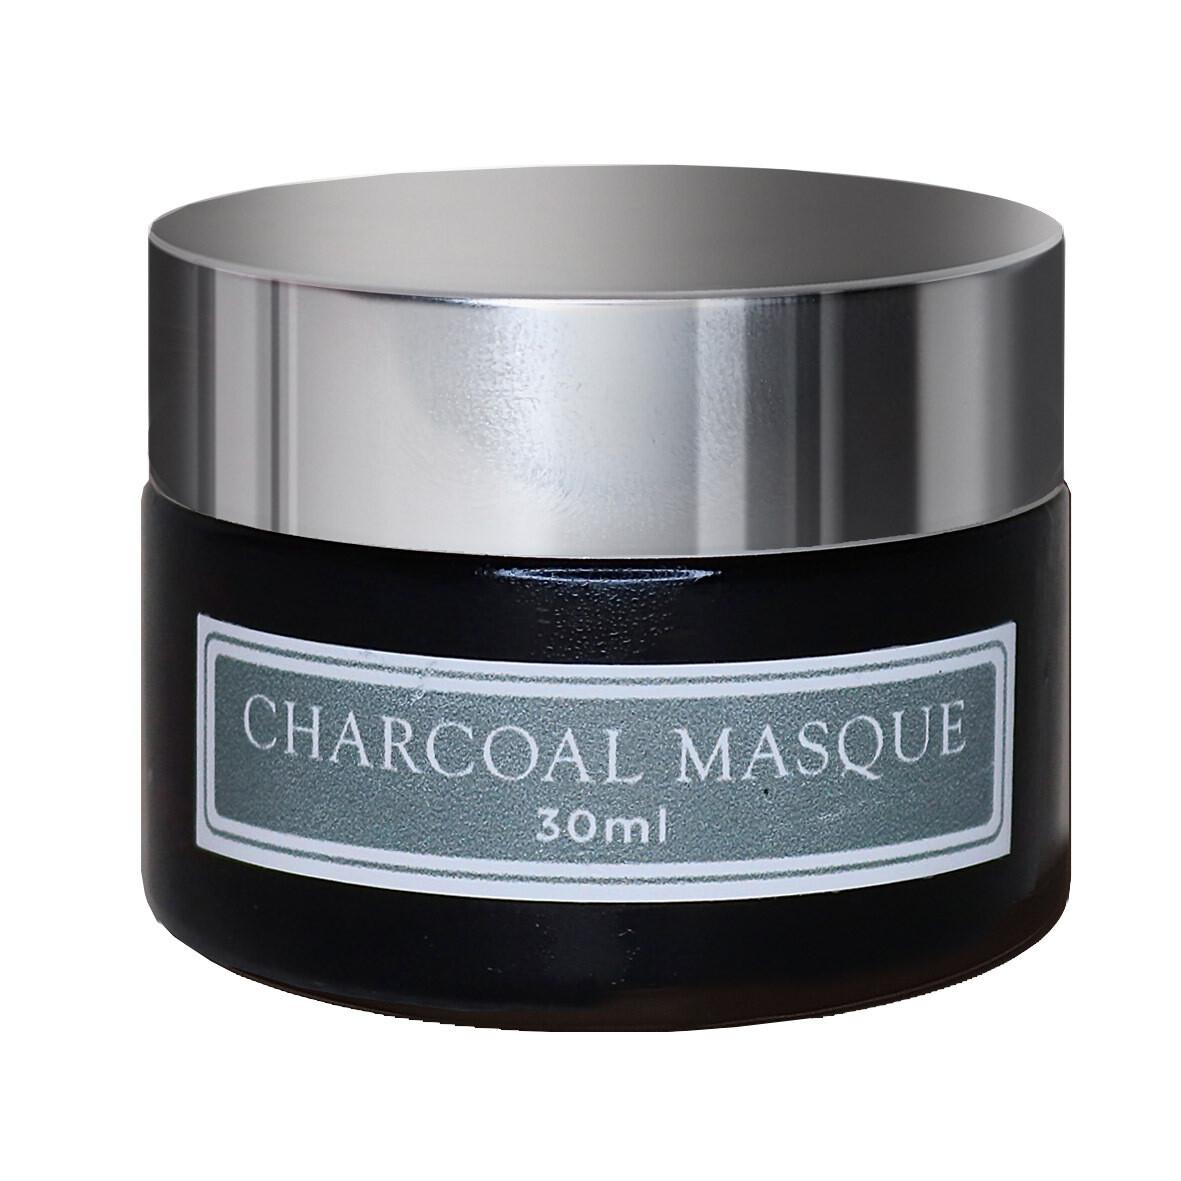 ENHANCE CHARCOAL MASQUE